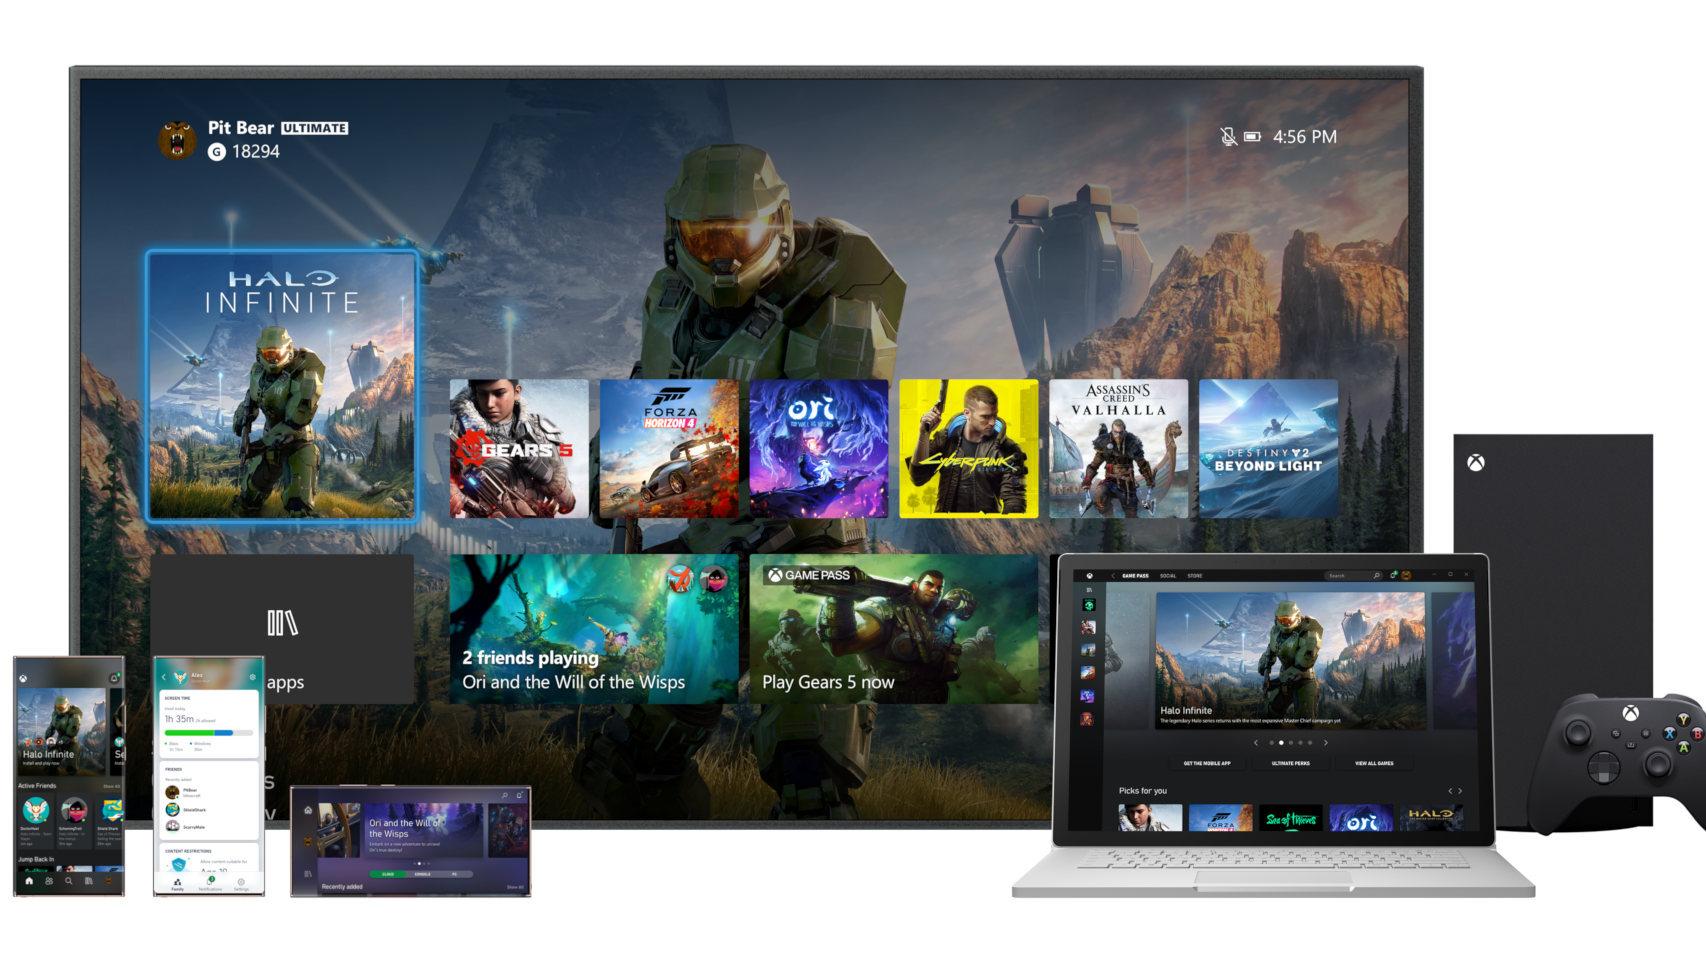 La nueva interfaz de Xbox